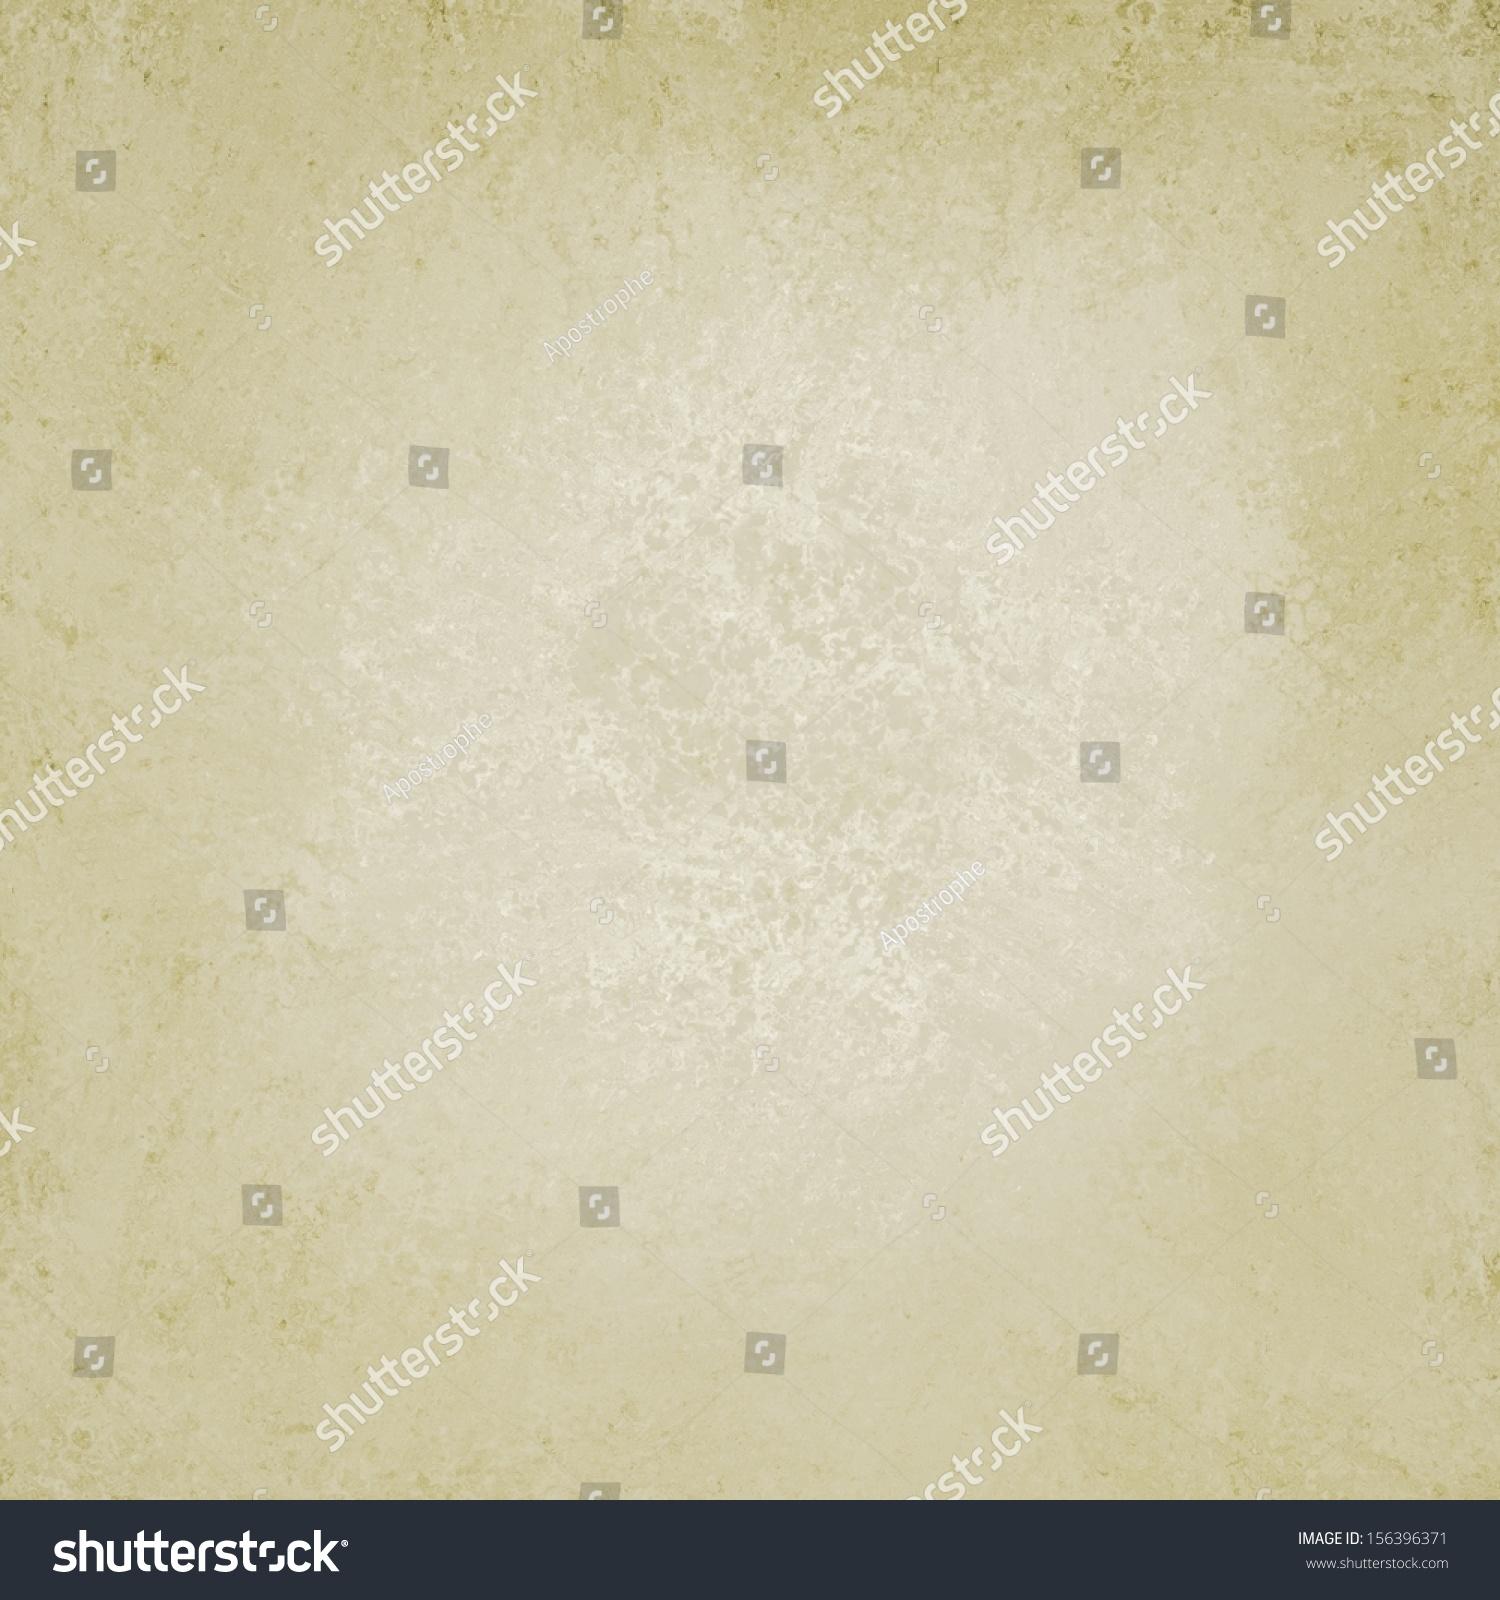 Tan Brown Background Soft Pastel Vintage Grunge Texture Light Solid Design Off White